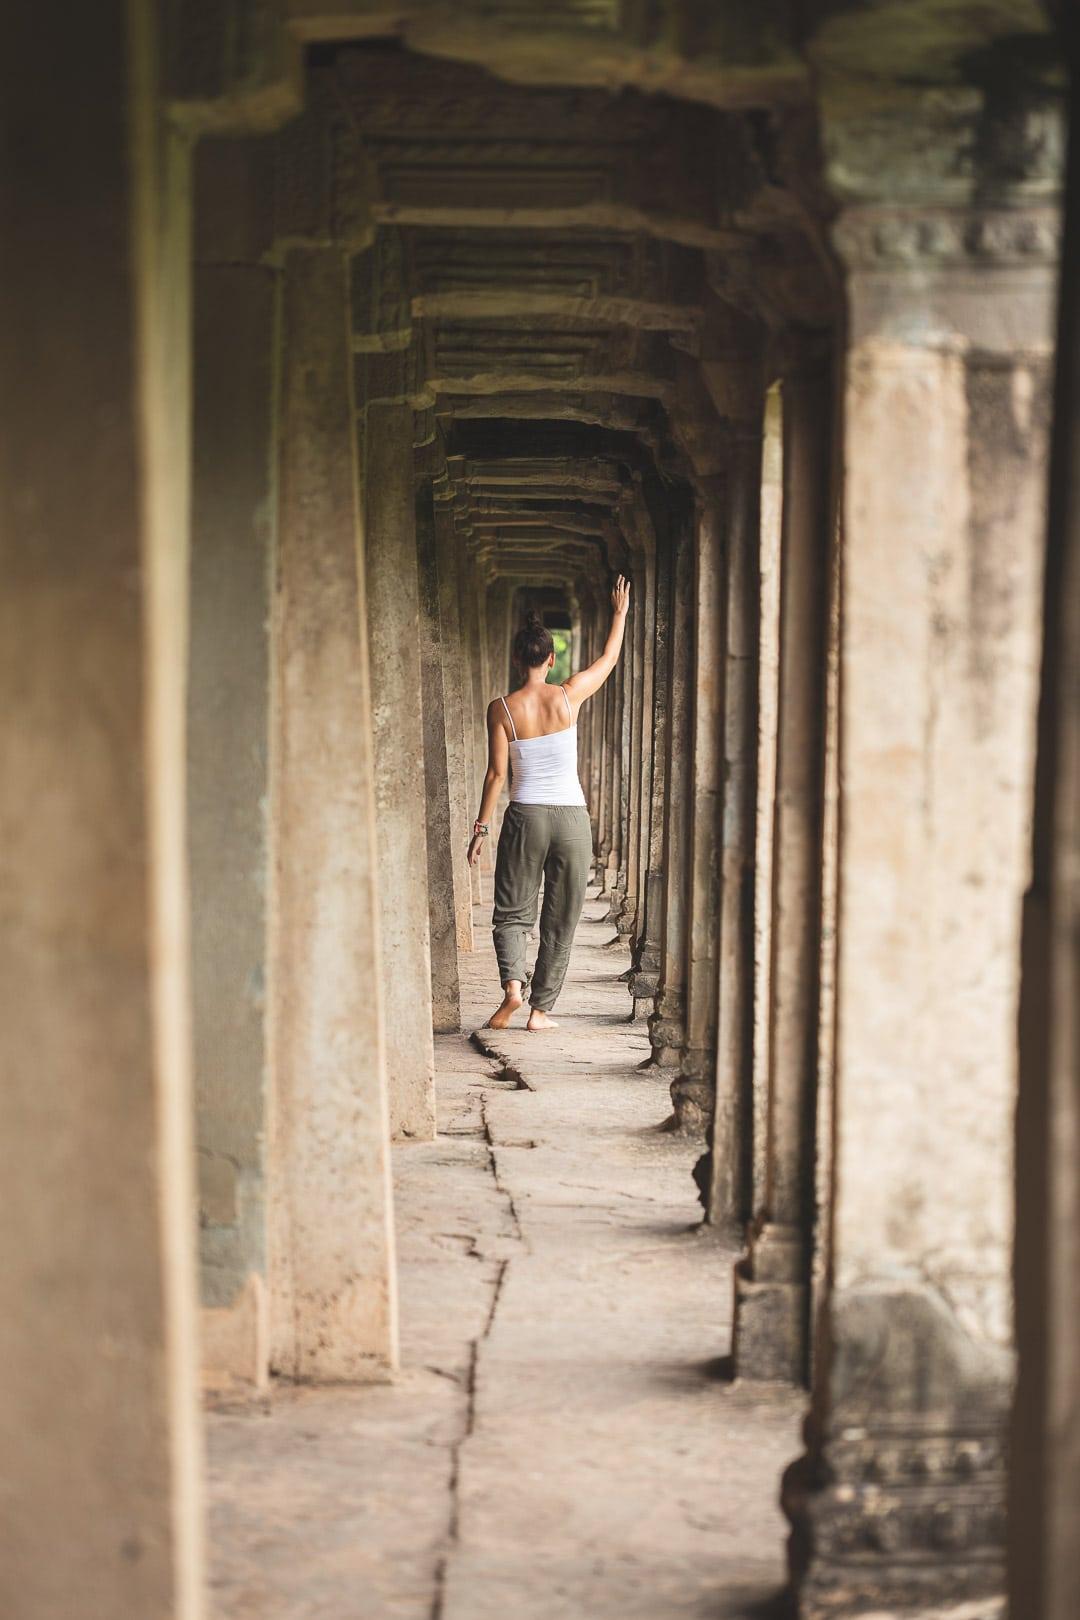 Sindhya skips through the hallways of Angkor Wat